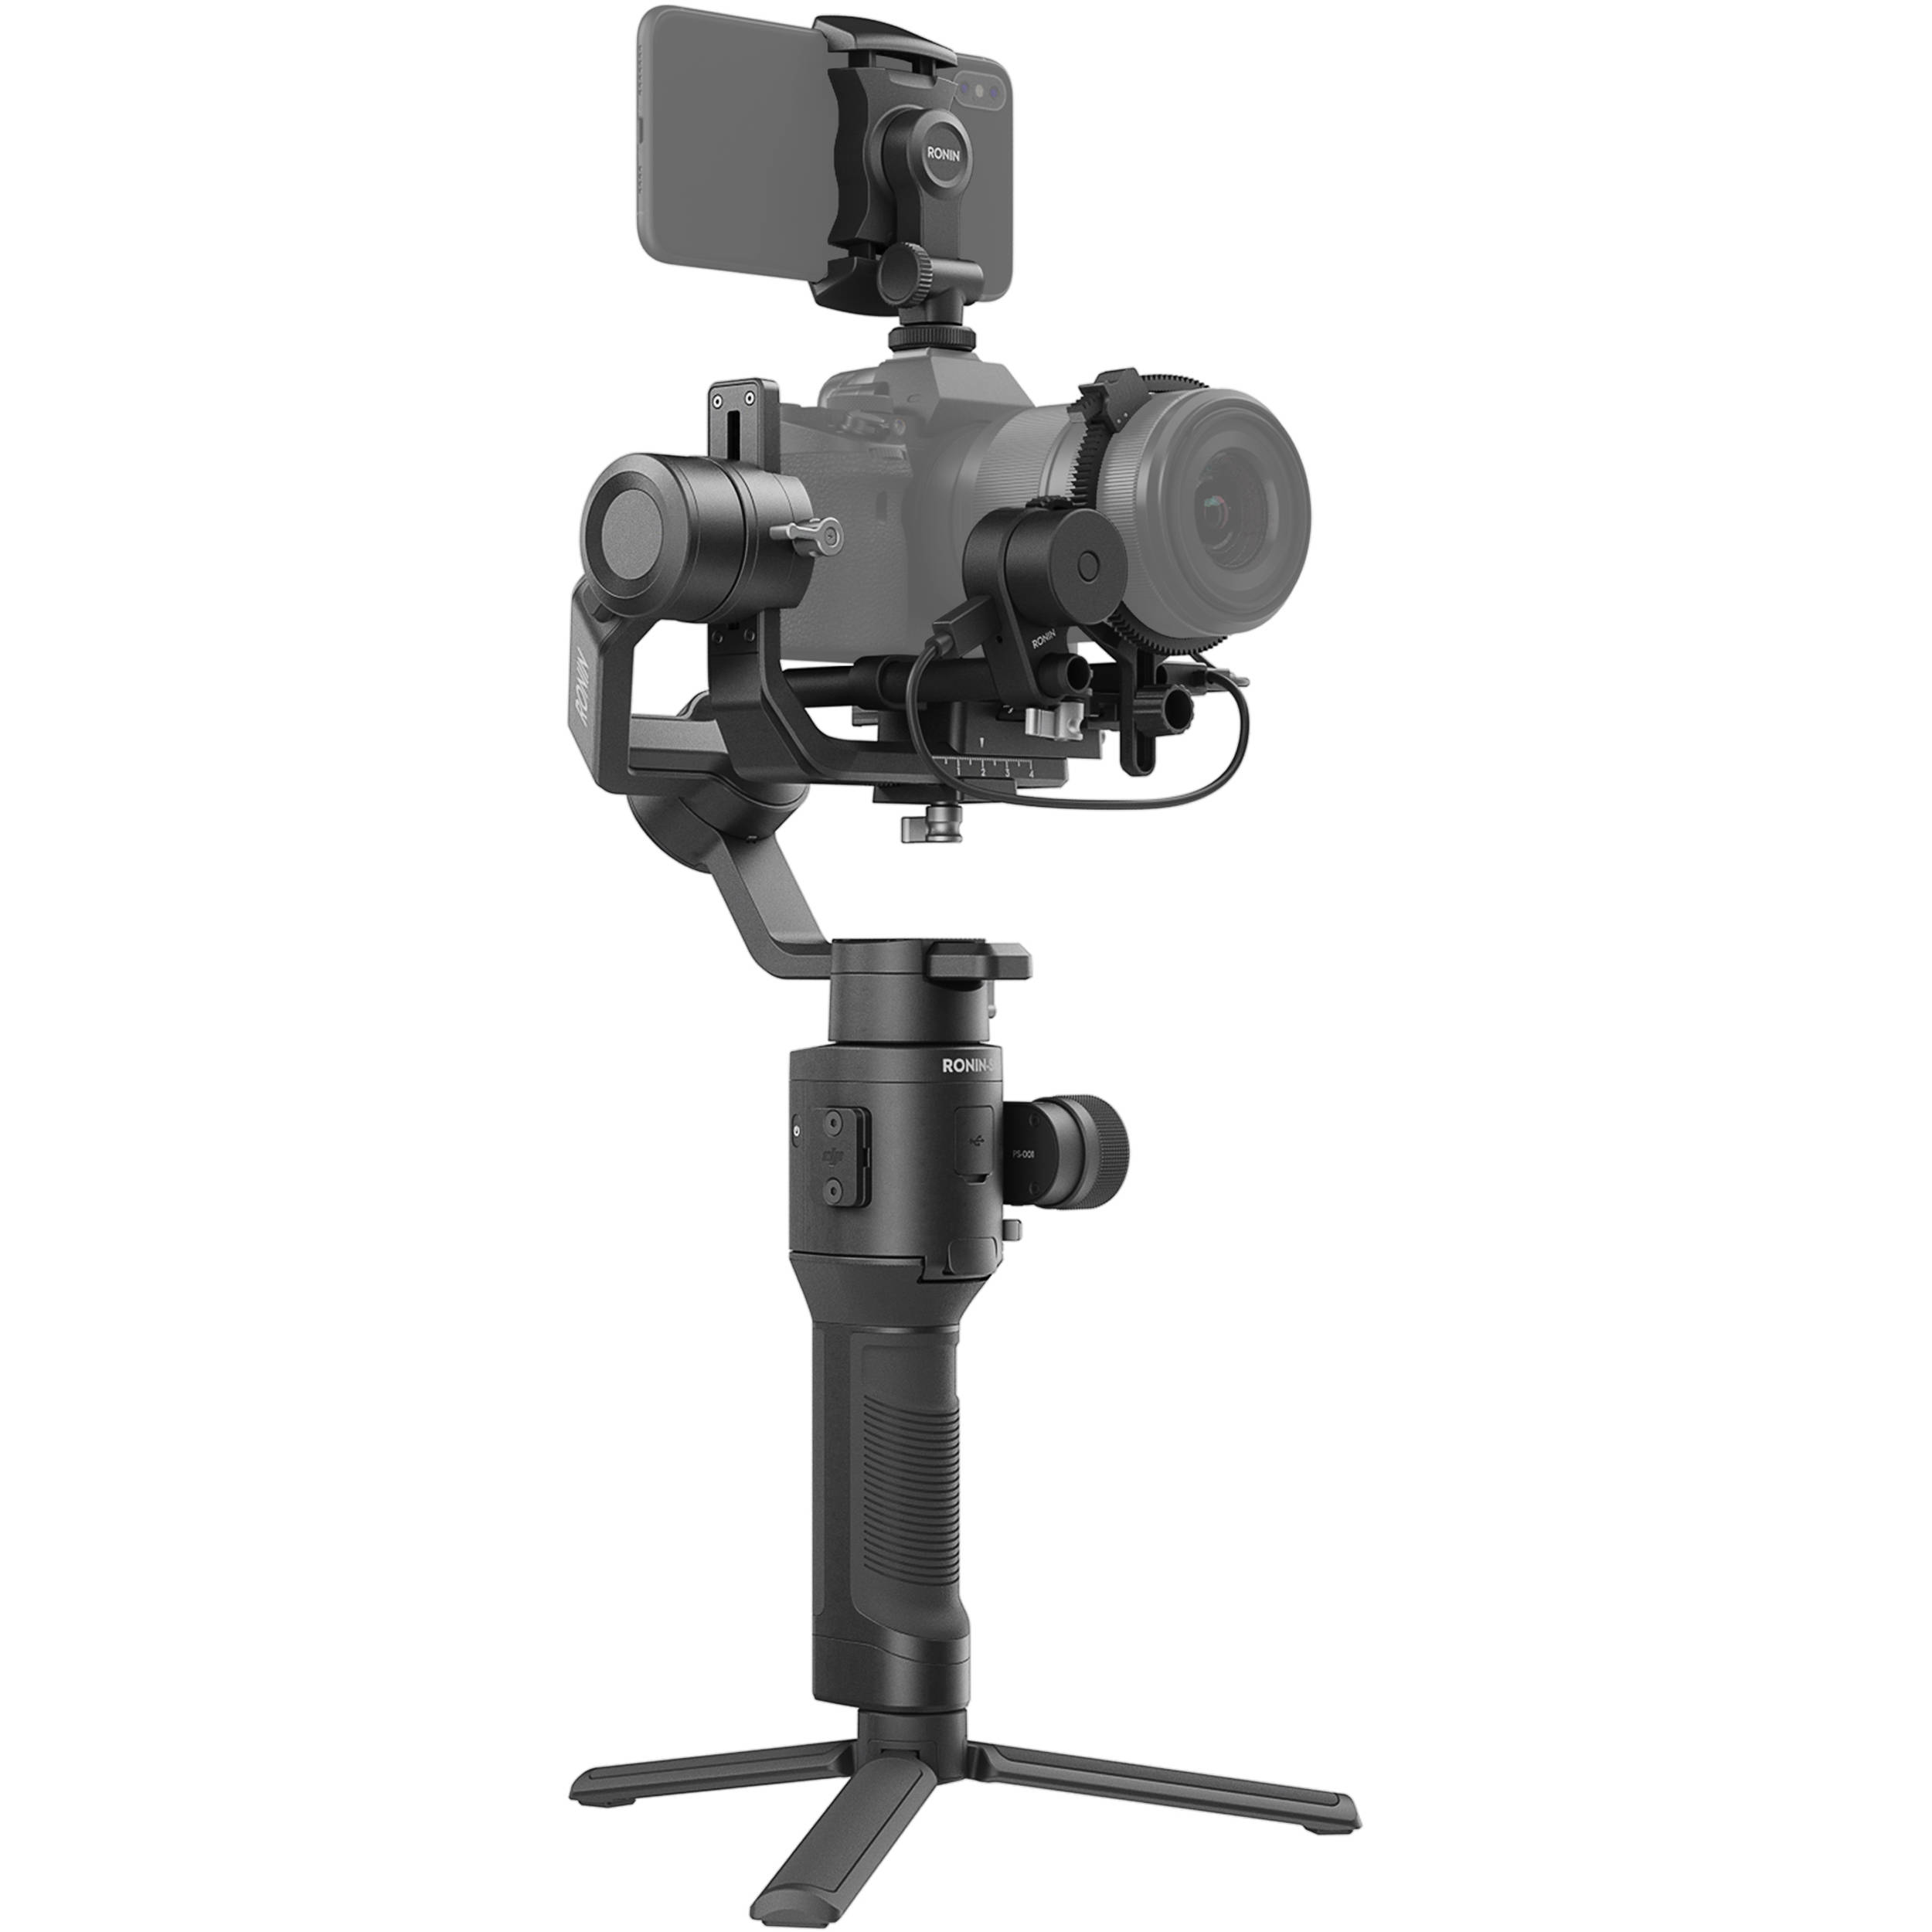 Ungehinderte Rollachse /& Sony NP-FZ100 Akku DJI Ronin-SC Pro Combo Gimbal InfoLITHIUM-Akku Z-Serie, 7,2V//16,4Wh Einhandgimbal f/ür spiegellose Kamerasysteme 2280 mAh schwarz